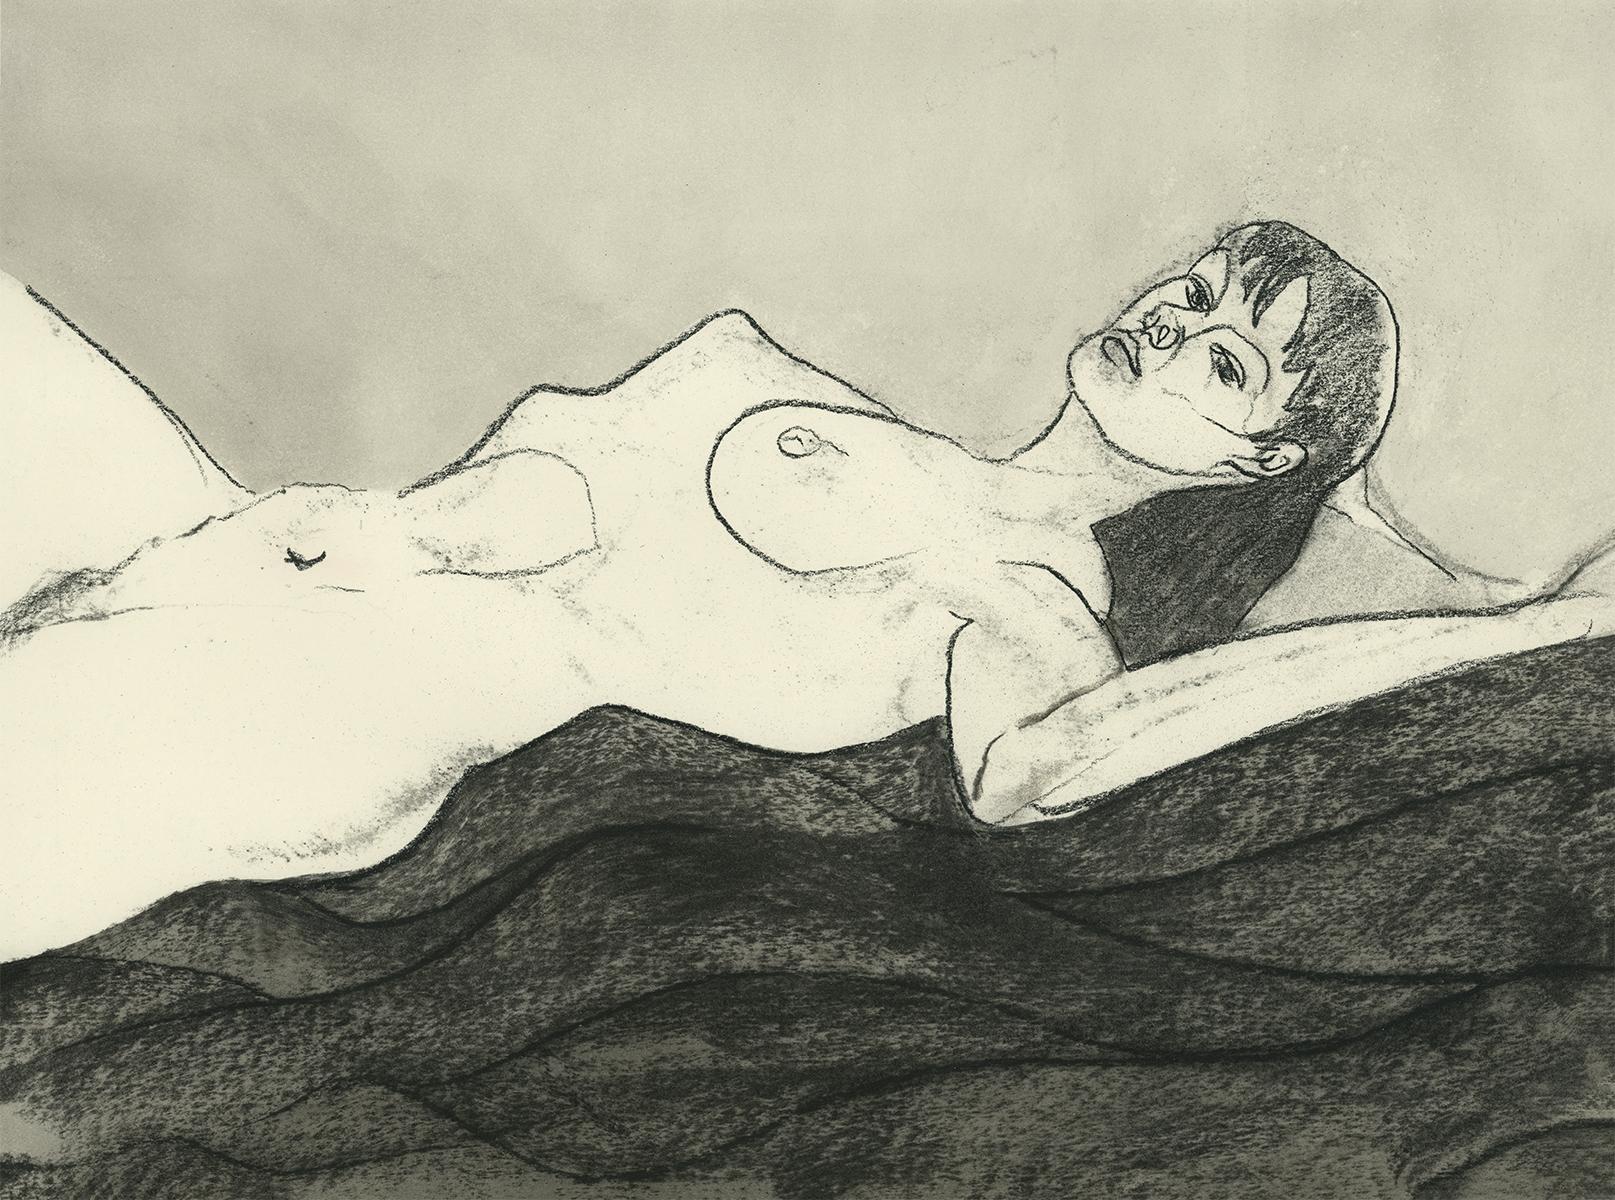 Miriam Reclining (11 x 14 inches)